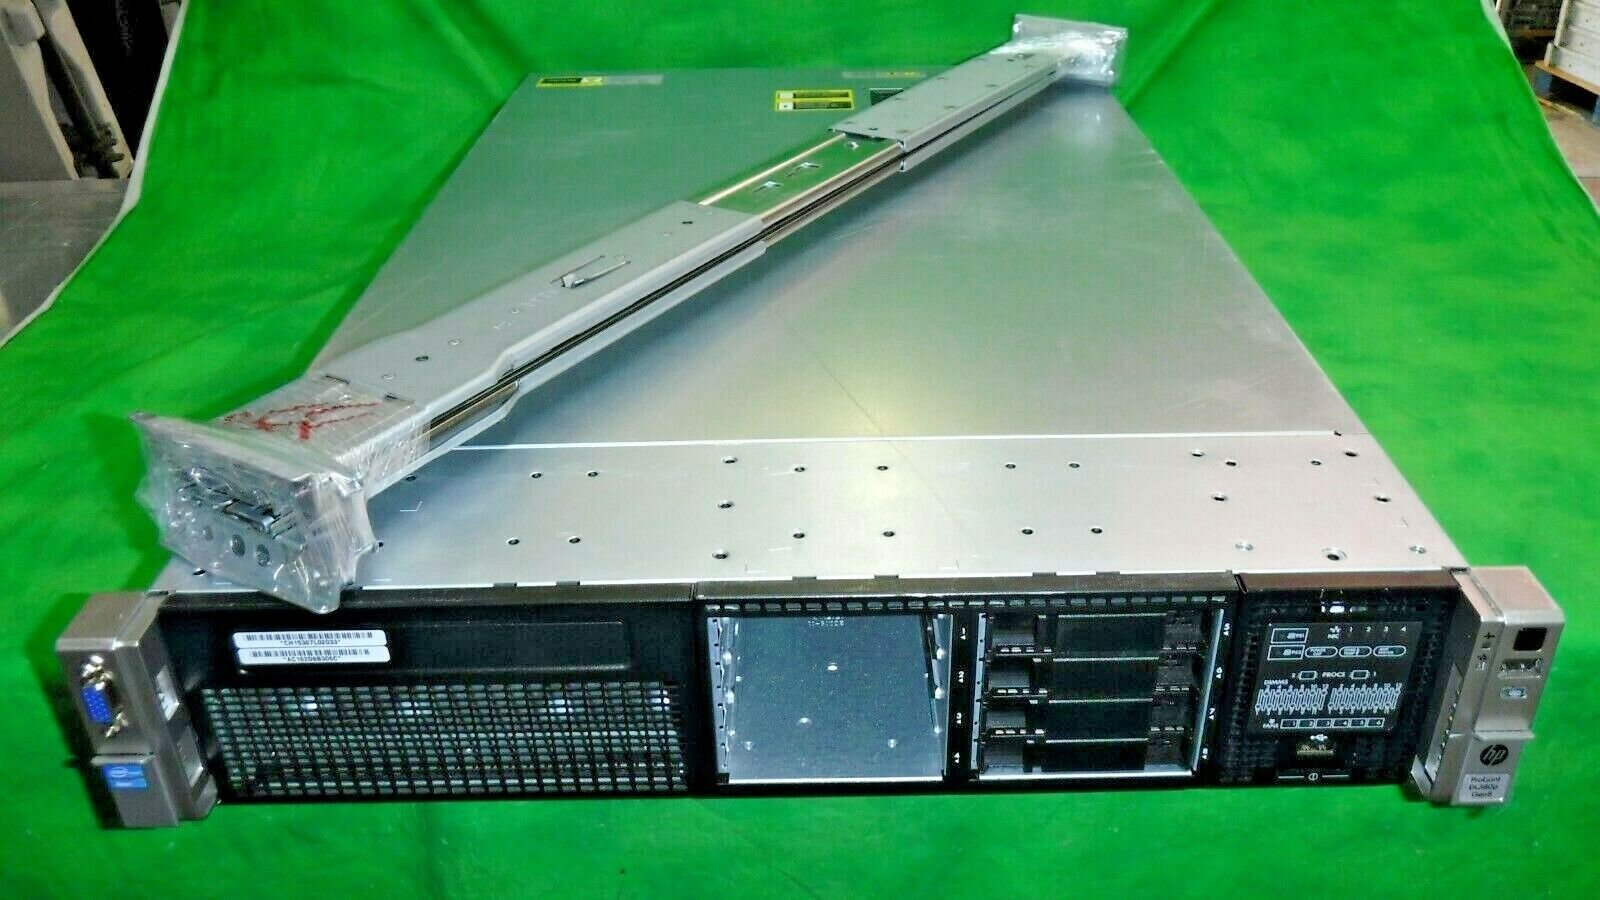 HP Proliant DL380 G7 SERVER 2x 6 CORE E5649 2.53GHz 16GB RAM NO HDD